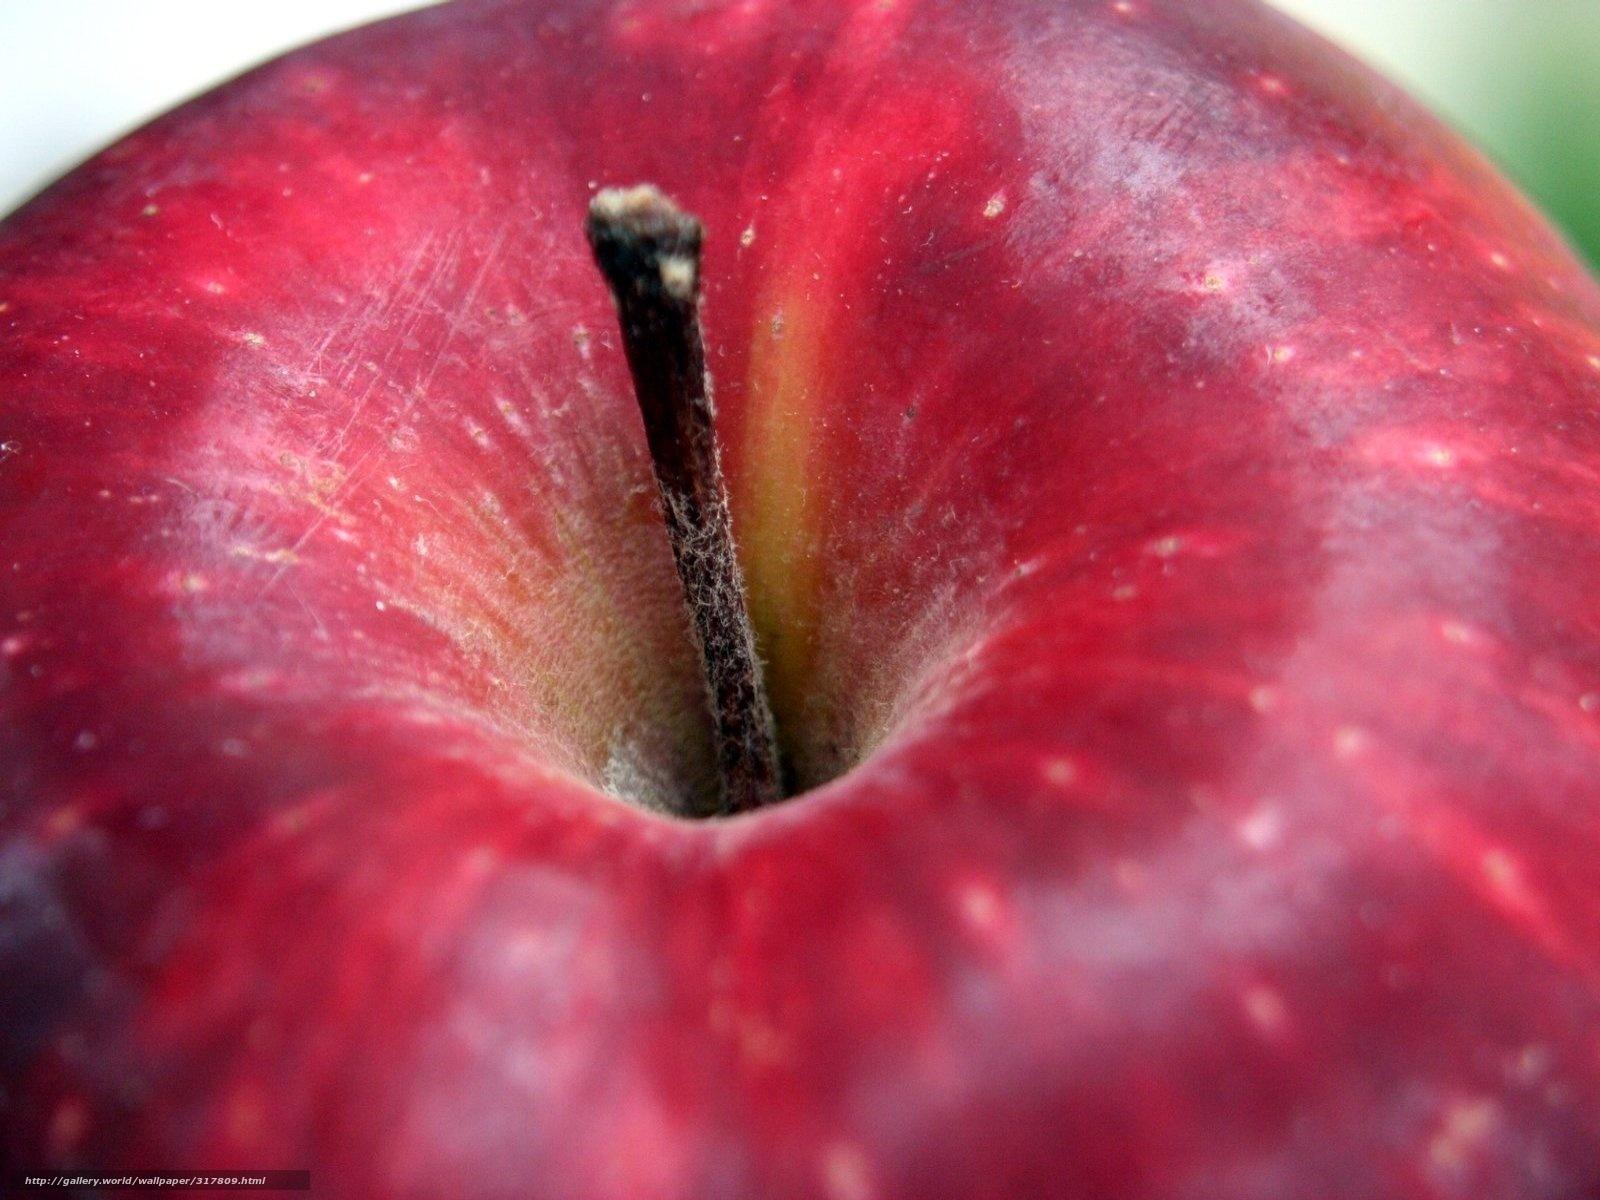 Apple fruit images download - Download Wallpaper Macro Apple Fruit Free Desktop Wallpaper In The Resolution 1600x1200 Picture 317809